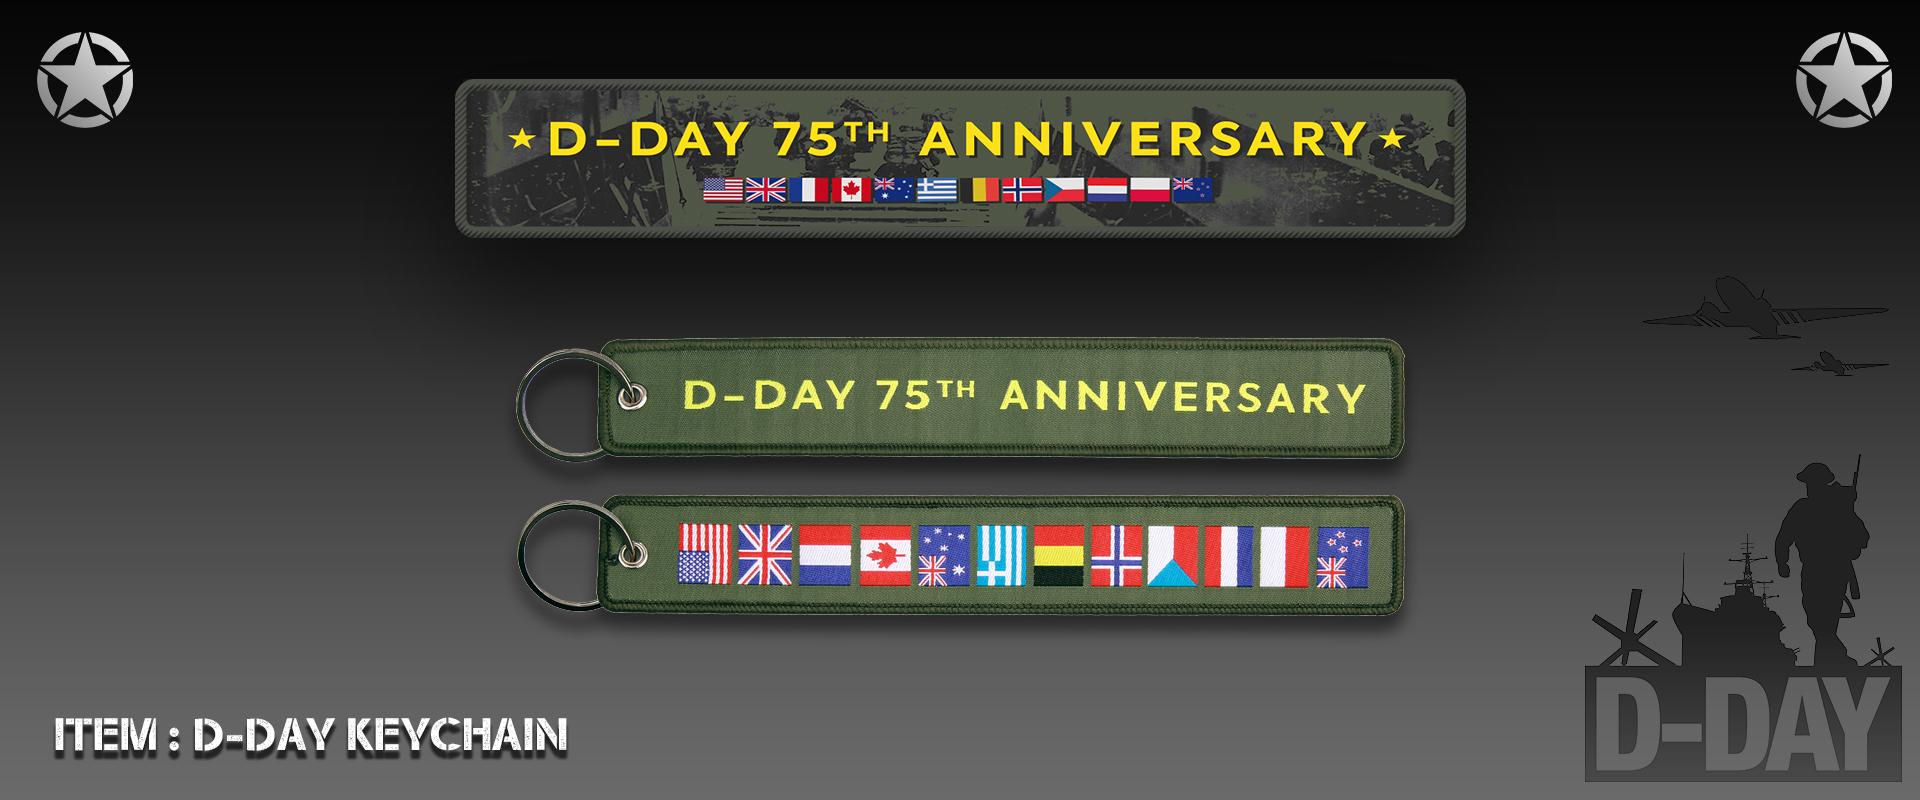 D-Day Keychain 75 Years Anniversary